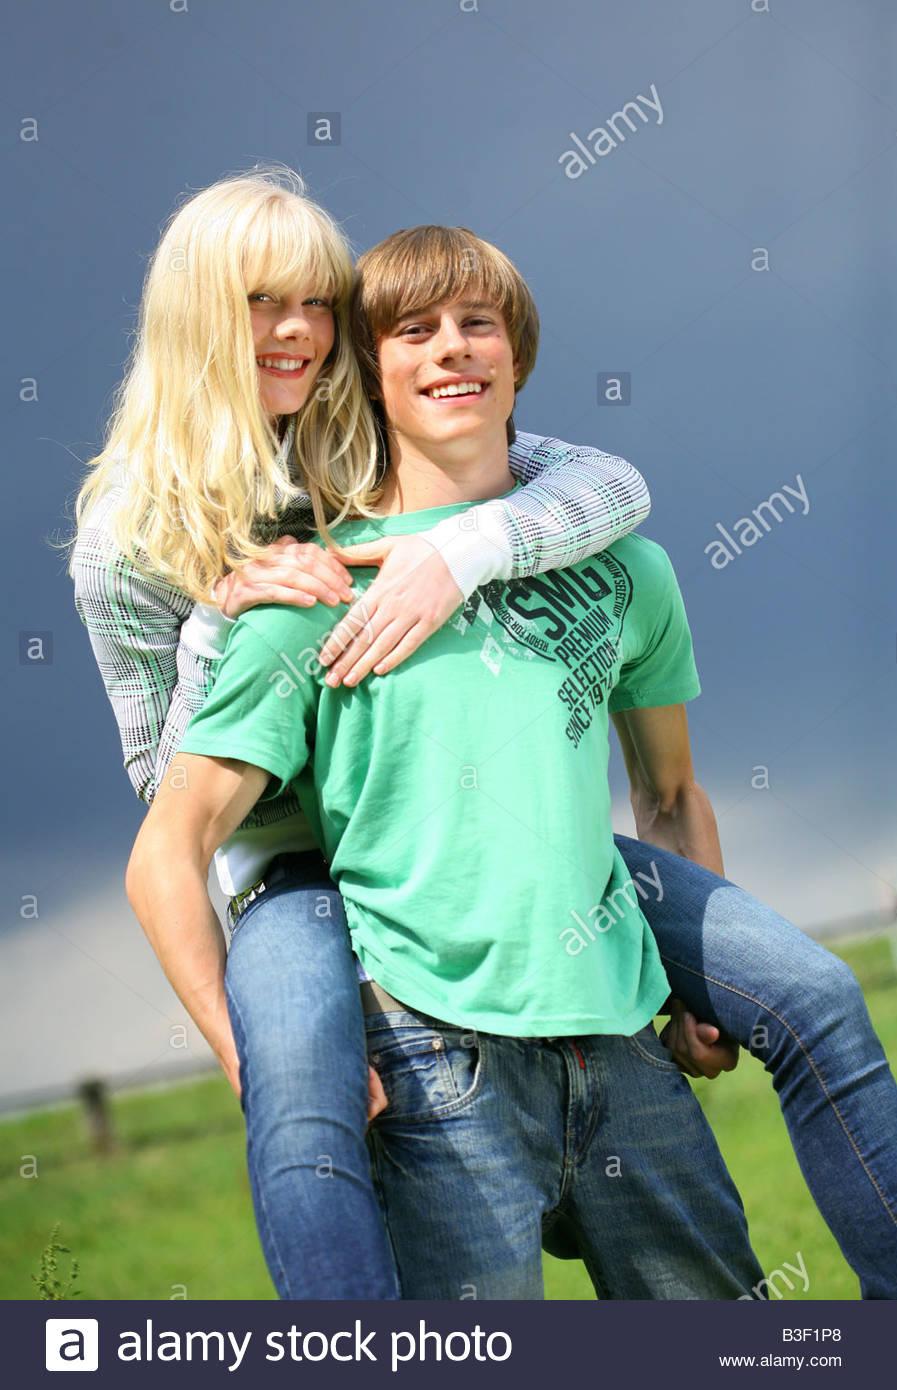 young man outdoors piggybacking woman and smiling Stock Photo